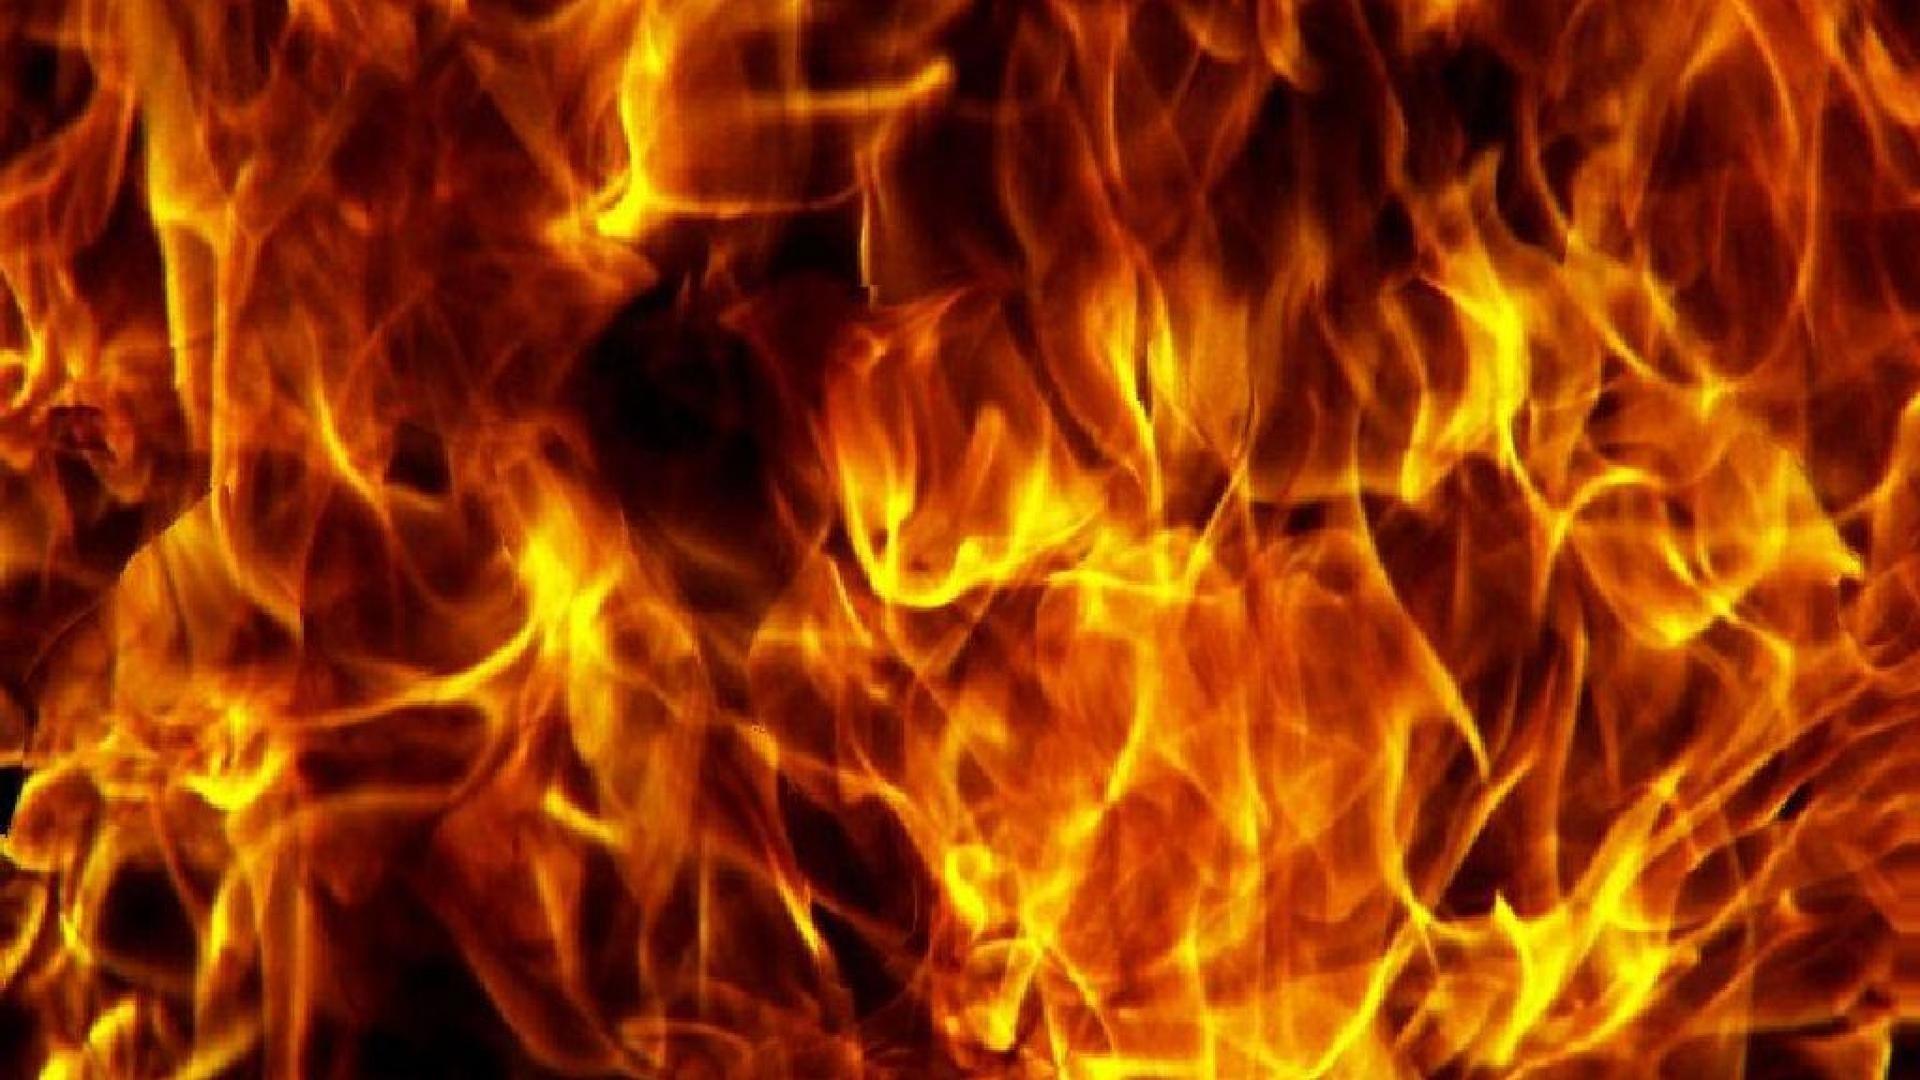 Kelly Fire Wallpaper Free: Fire Desktop Backgrounds (61+ Images